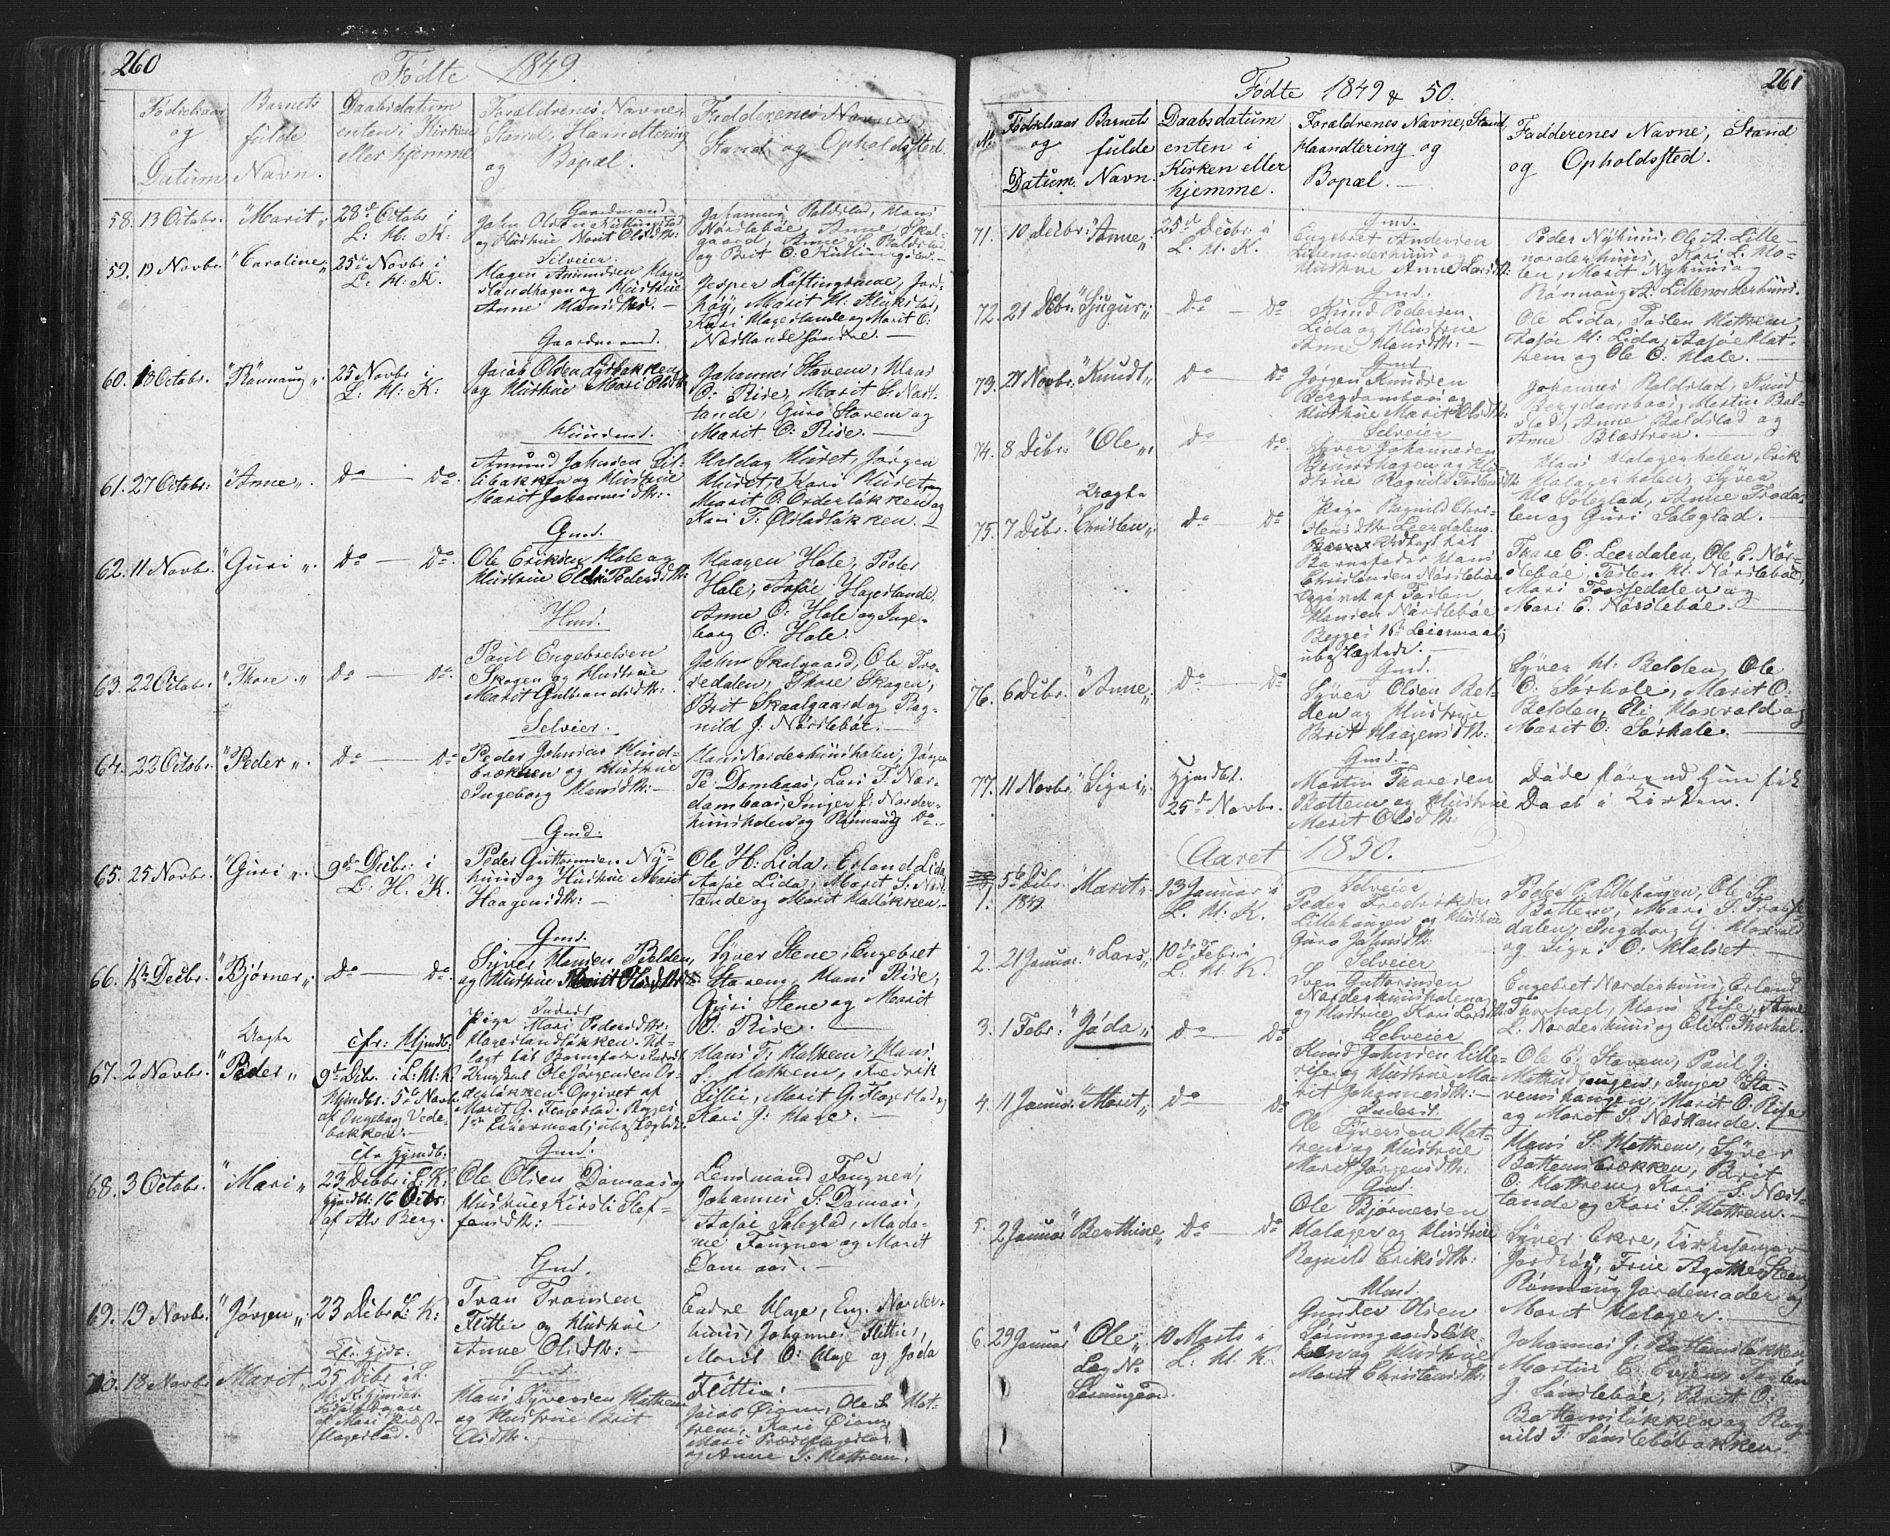 SAH, Lesja prestekontor, Klokkerbok nr. 2, 1832-1850, s. 260-261